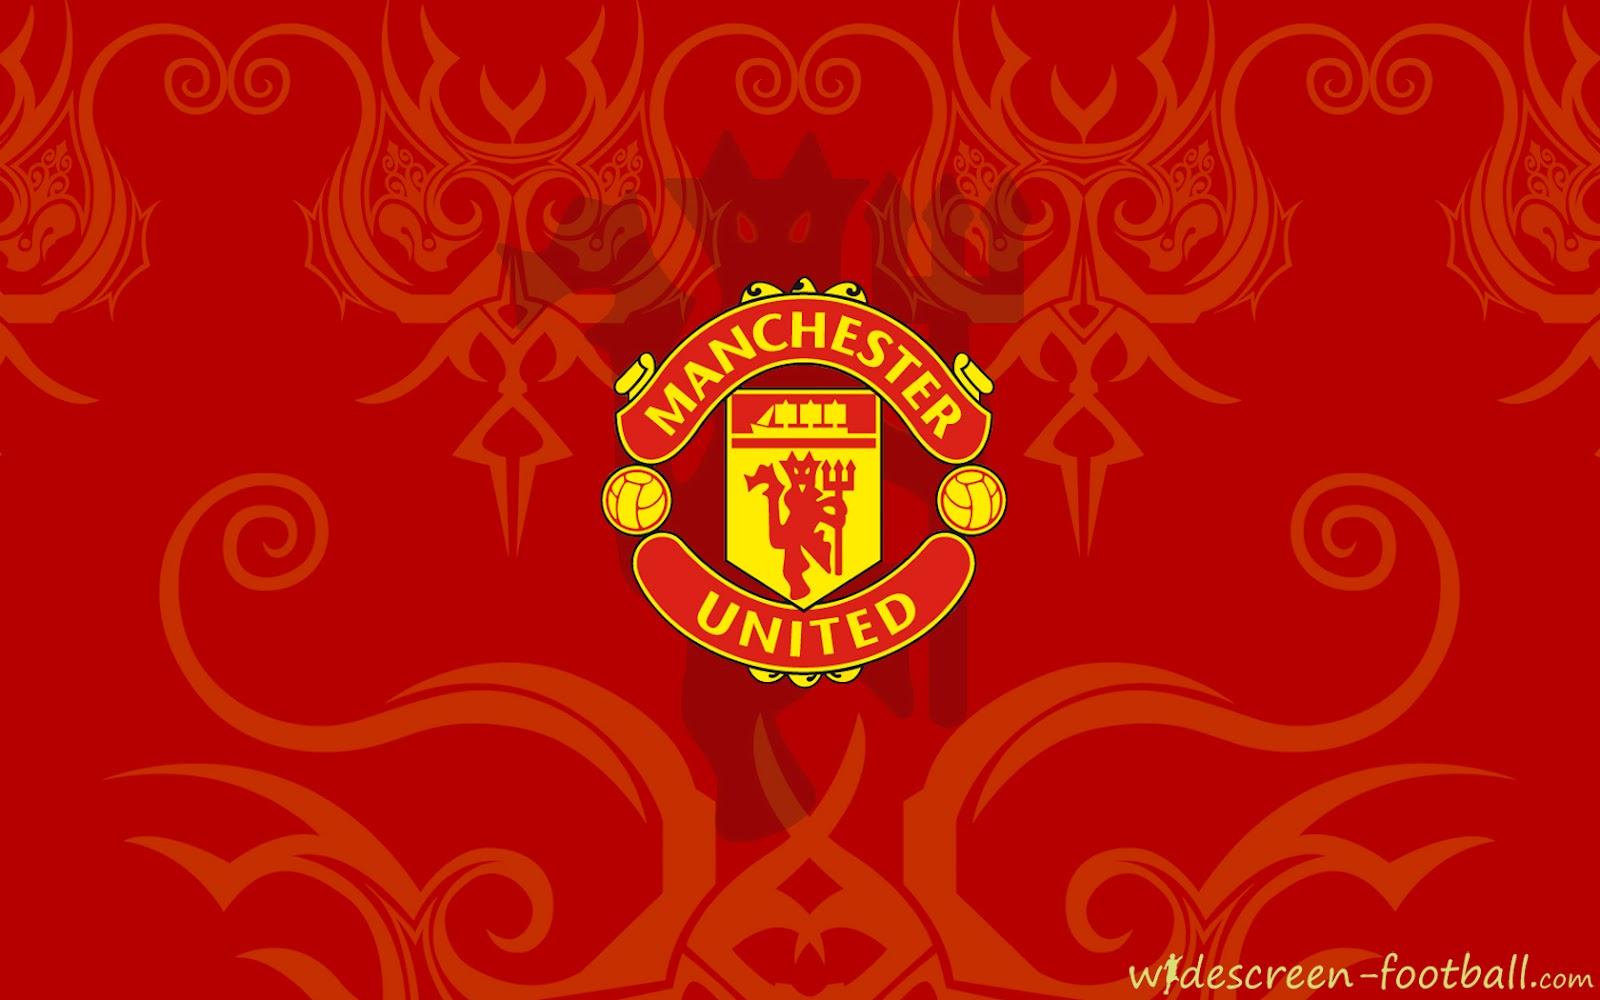 Manchester united beautiful logo wallpaper Manchester United 1600x1000